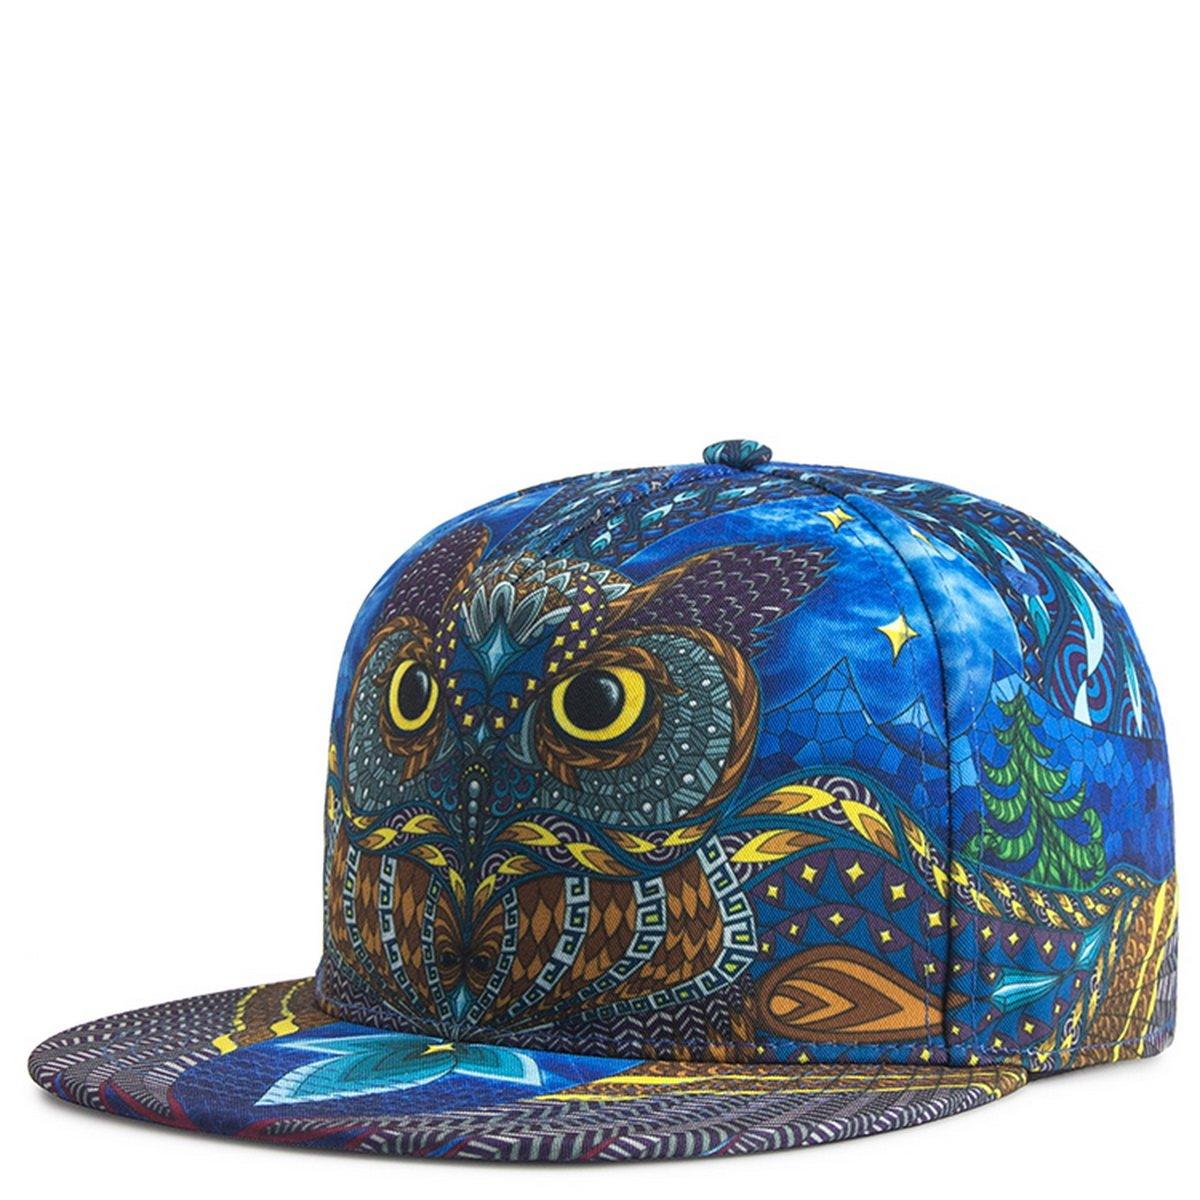 TESOON Unisex Snapback Hats ,Adjustable Printed Flat Brim Cap Hip Hop Hats TESOON Mens Street Hat